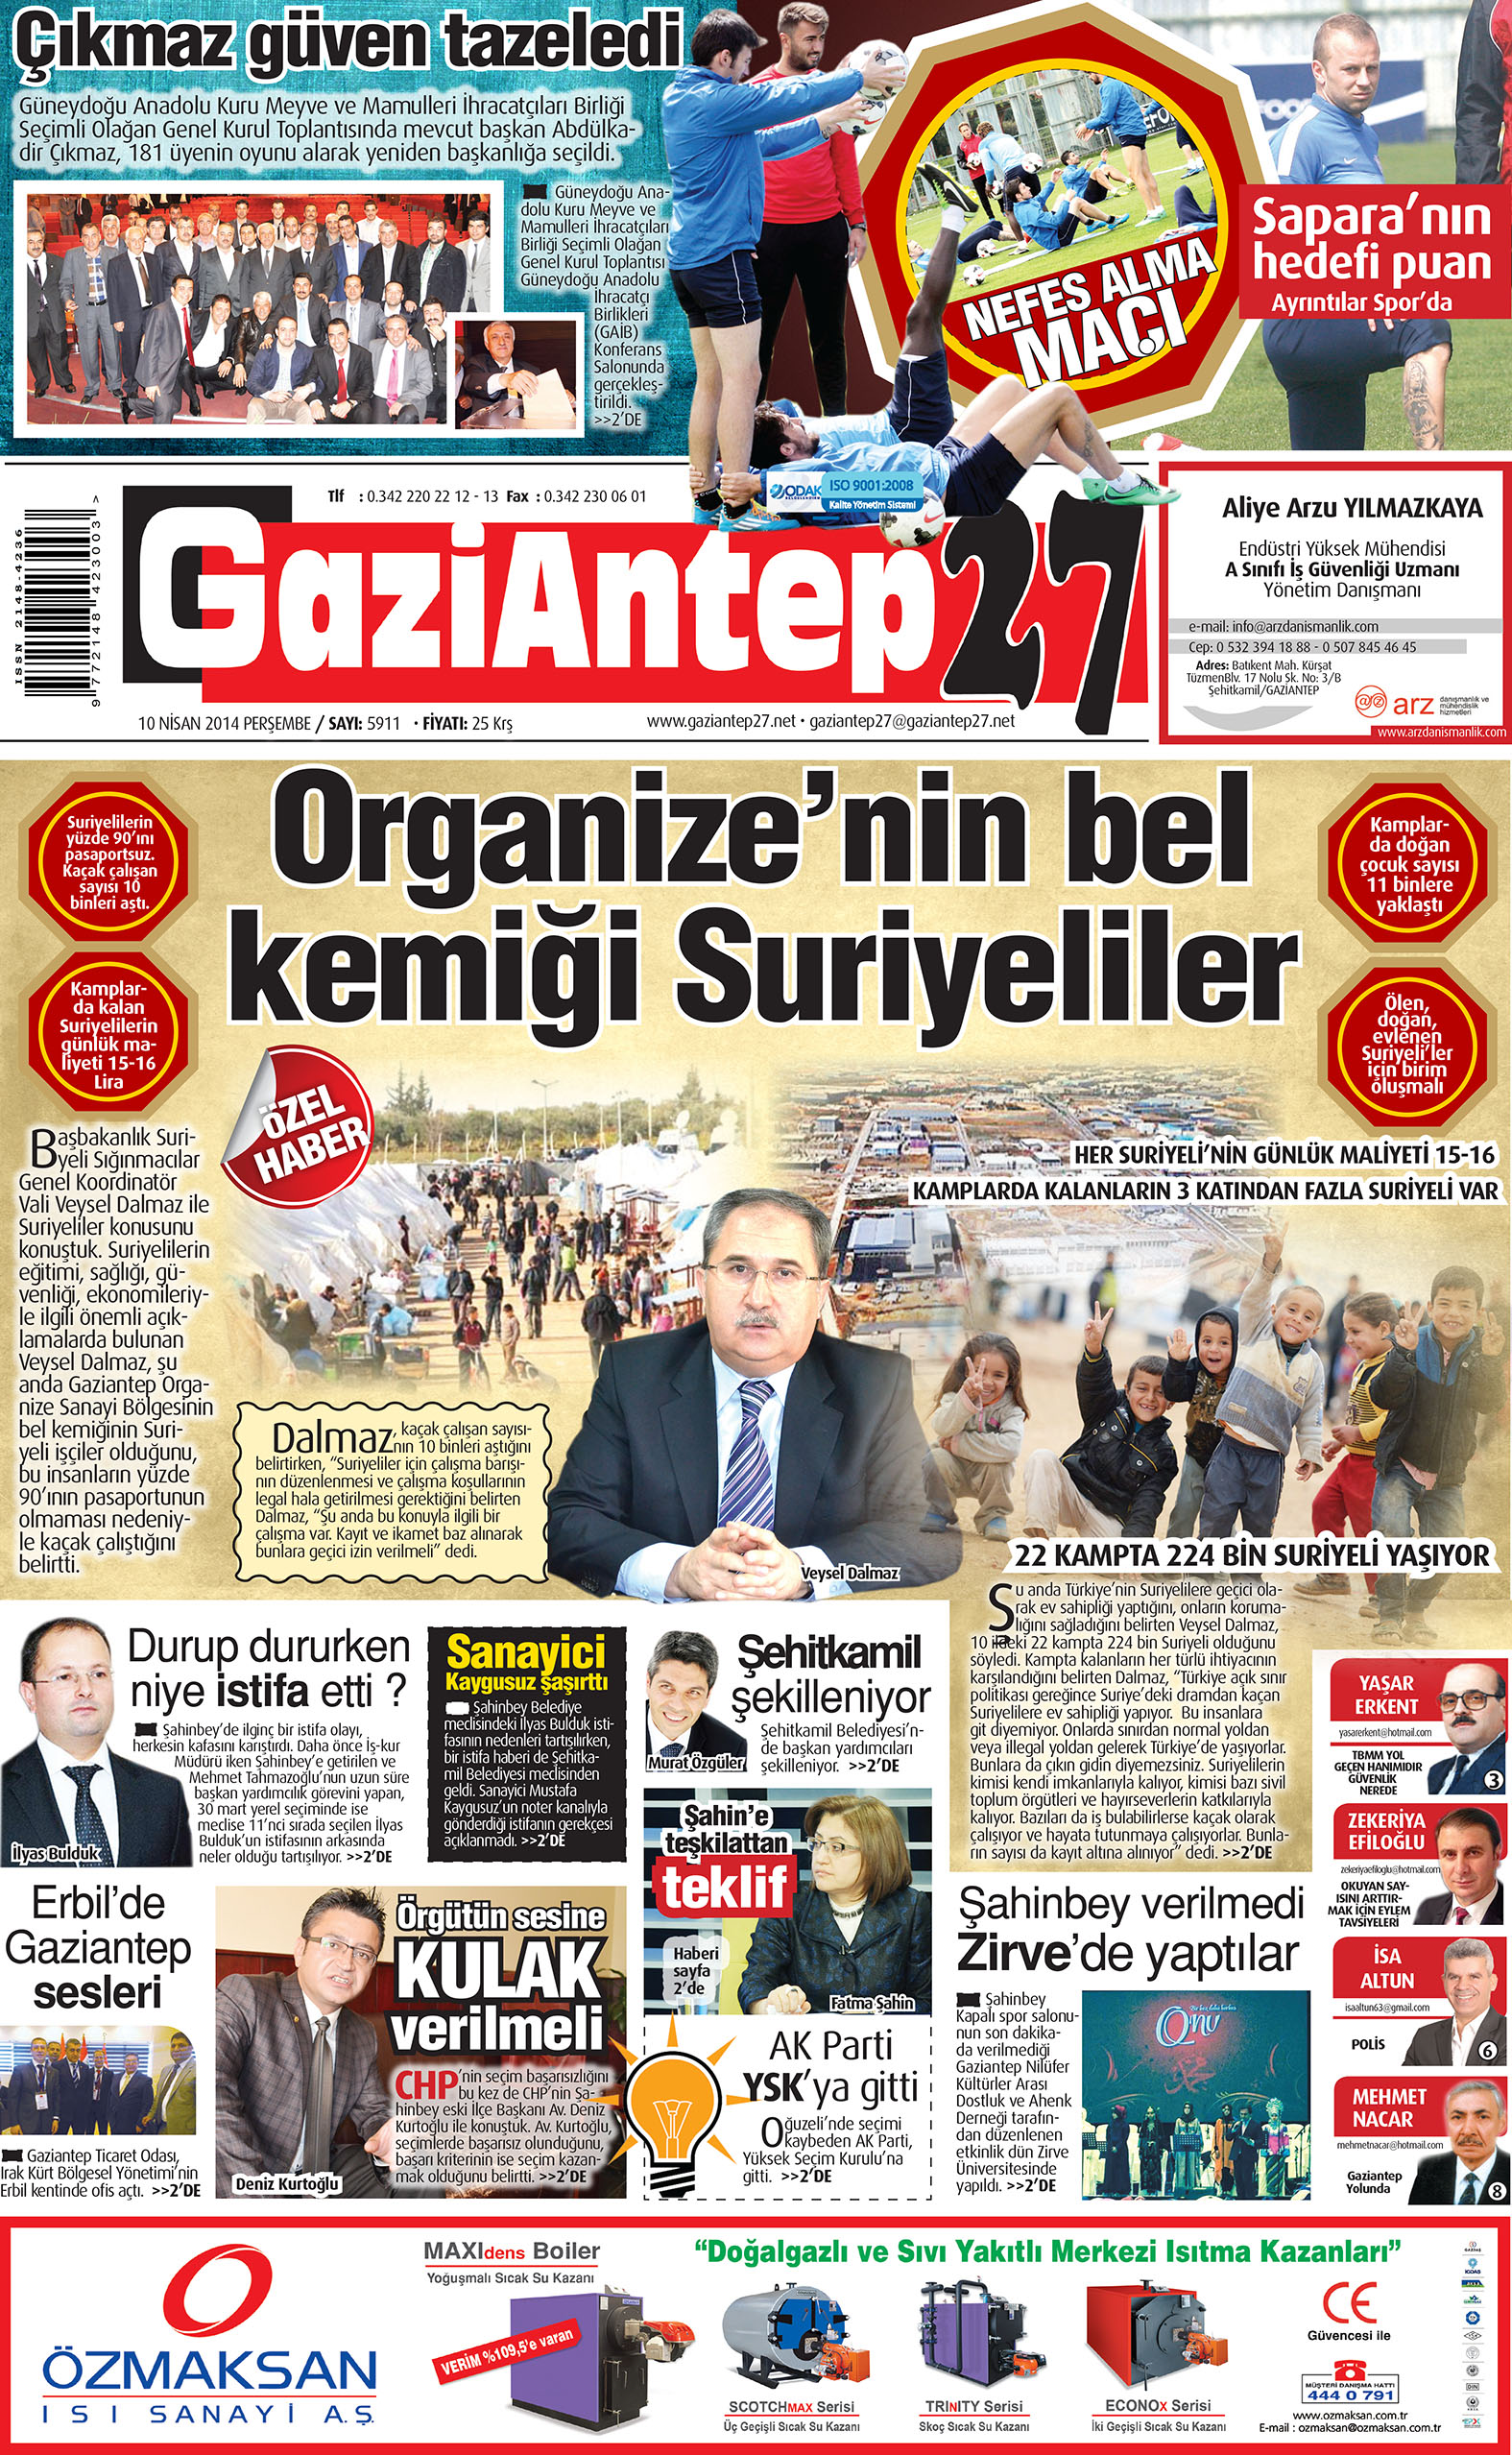 10 Nisan 2014 sayfalar 1